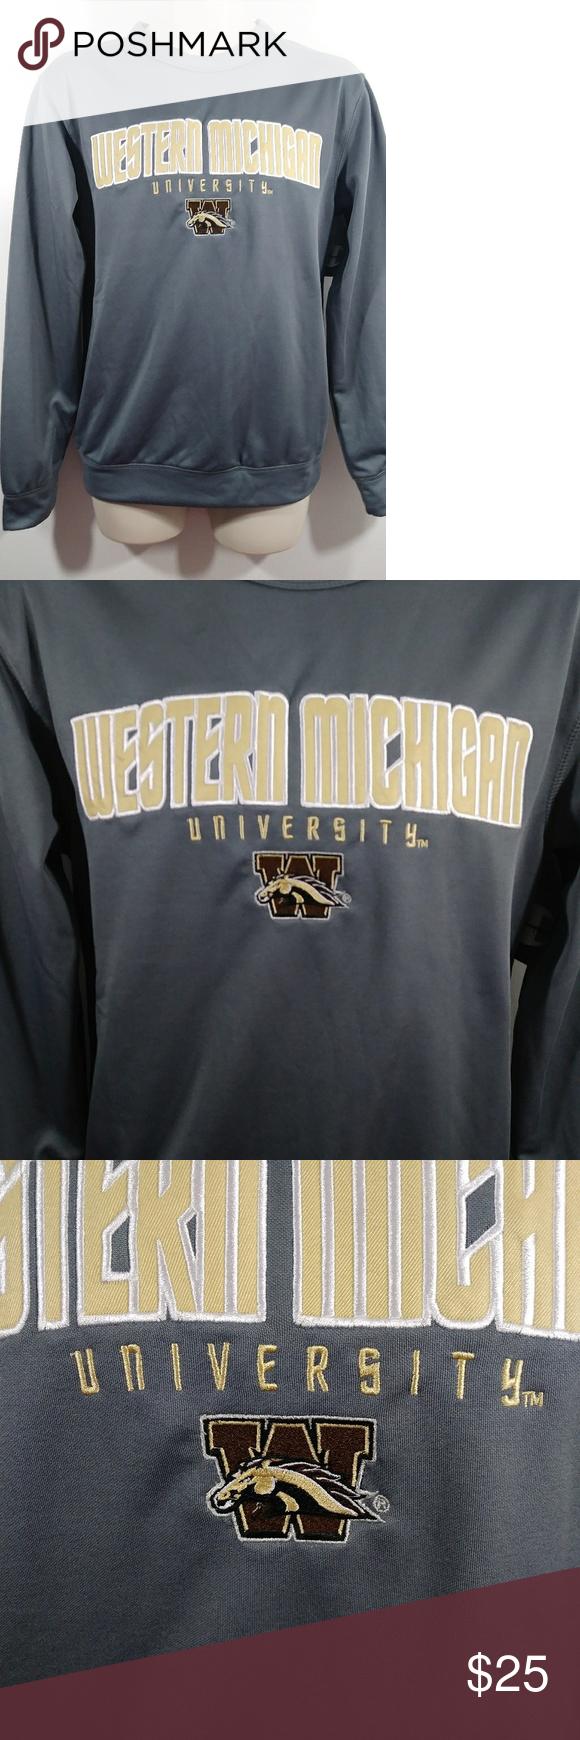 Champion Men S Wmu Broncos Sweatshirt Small Champion Western Michigan University With Broncos Logo Gray With Champion Shirts Clothes Design Broncos Sweatshirt [ 1740 x 580 Pixel ]